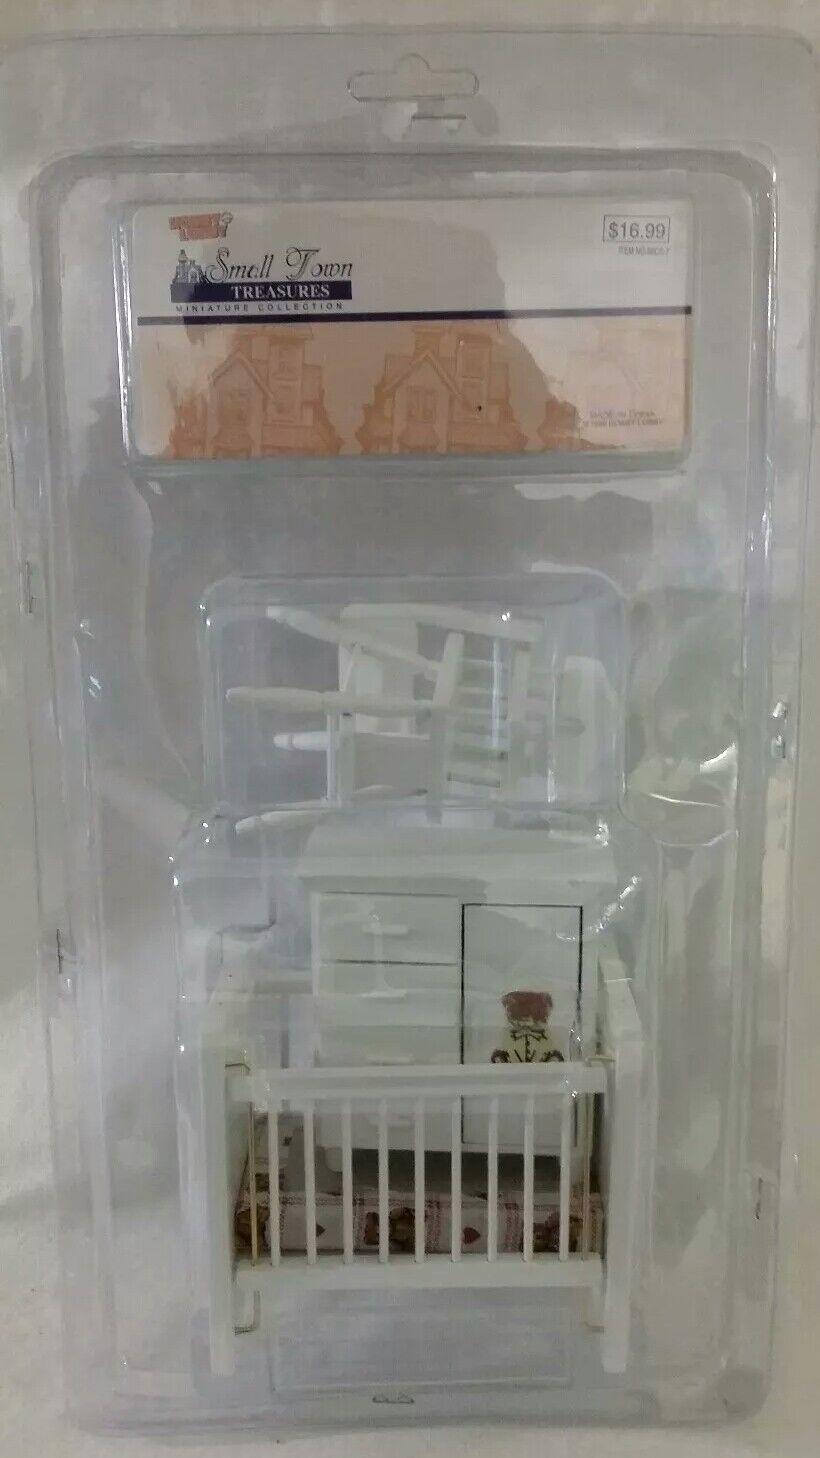 NOS 1998 NRFP Hobby Lobby Small Town Treasures Infant Baby Crib Bedroom Set NEW